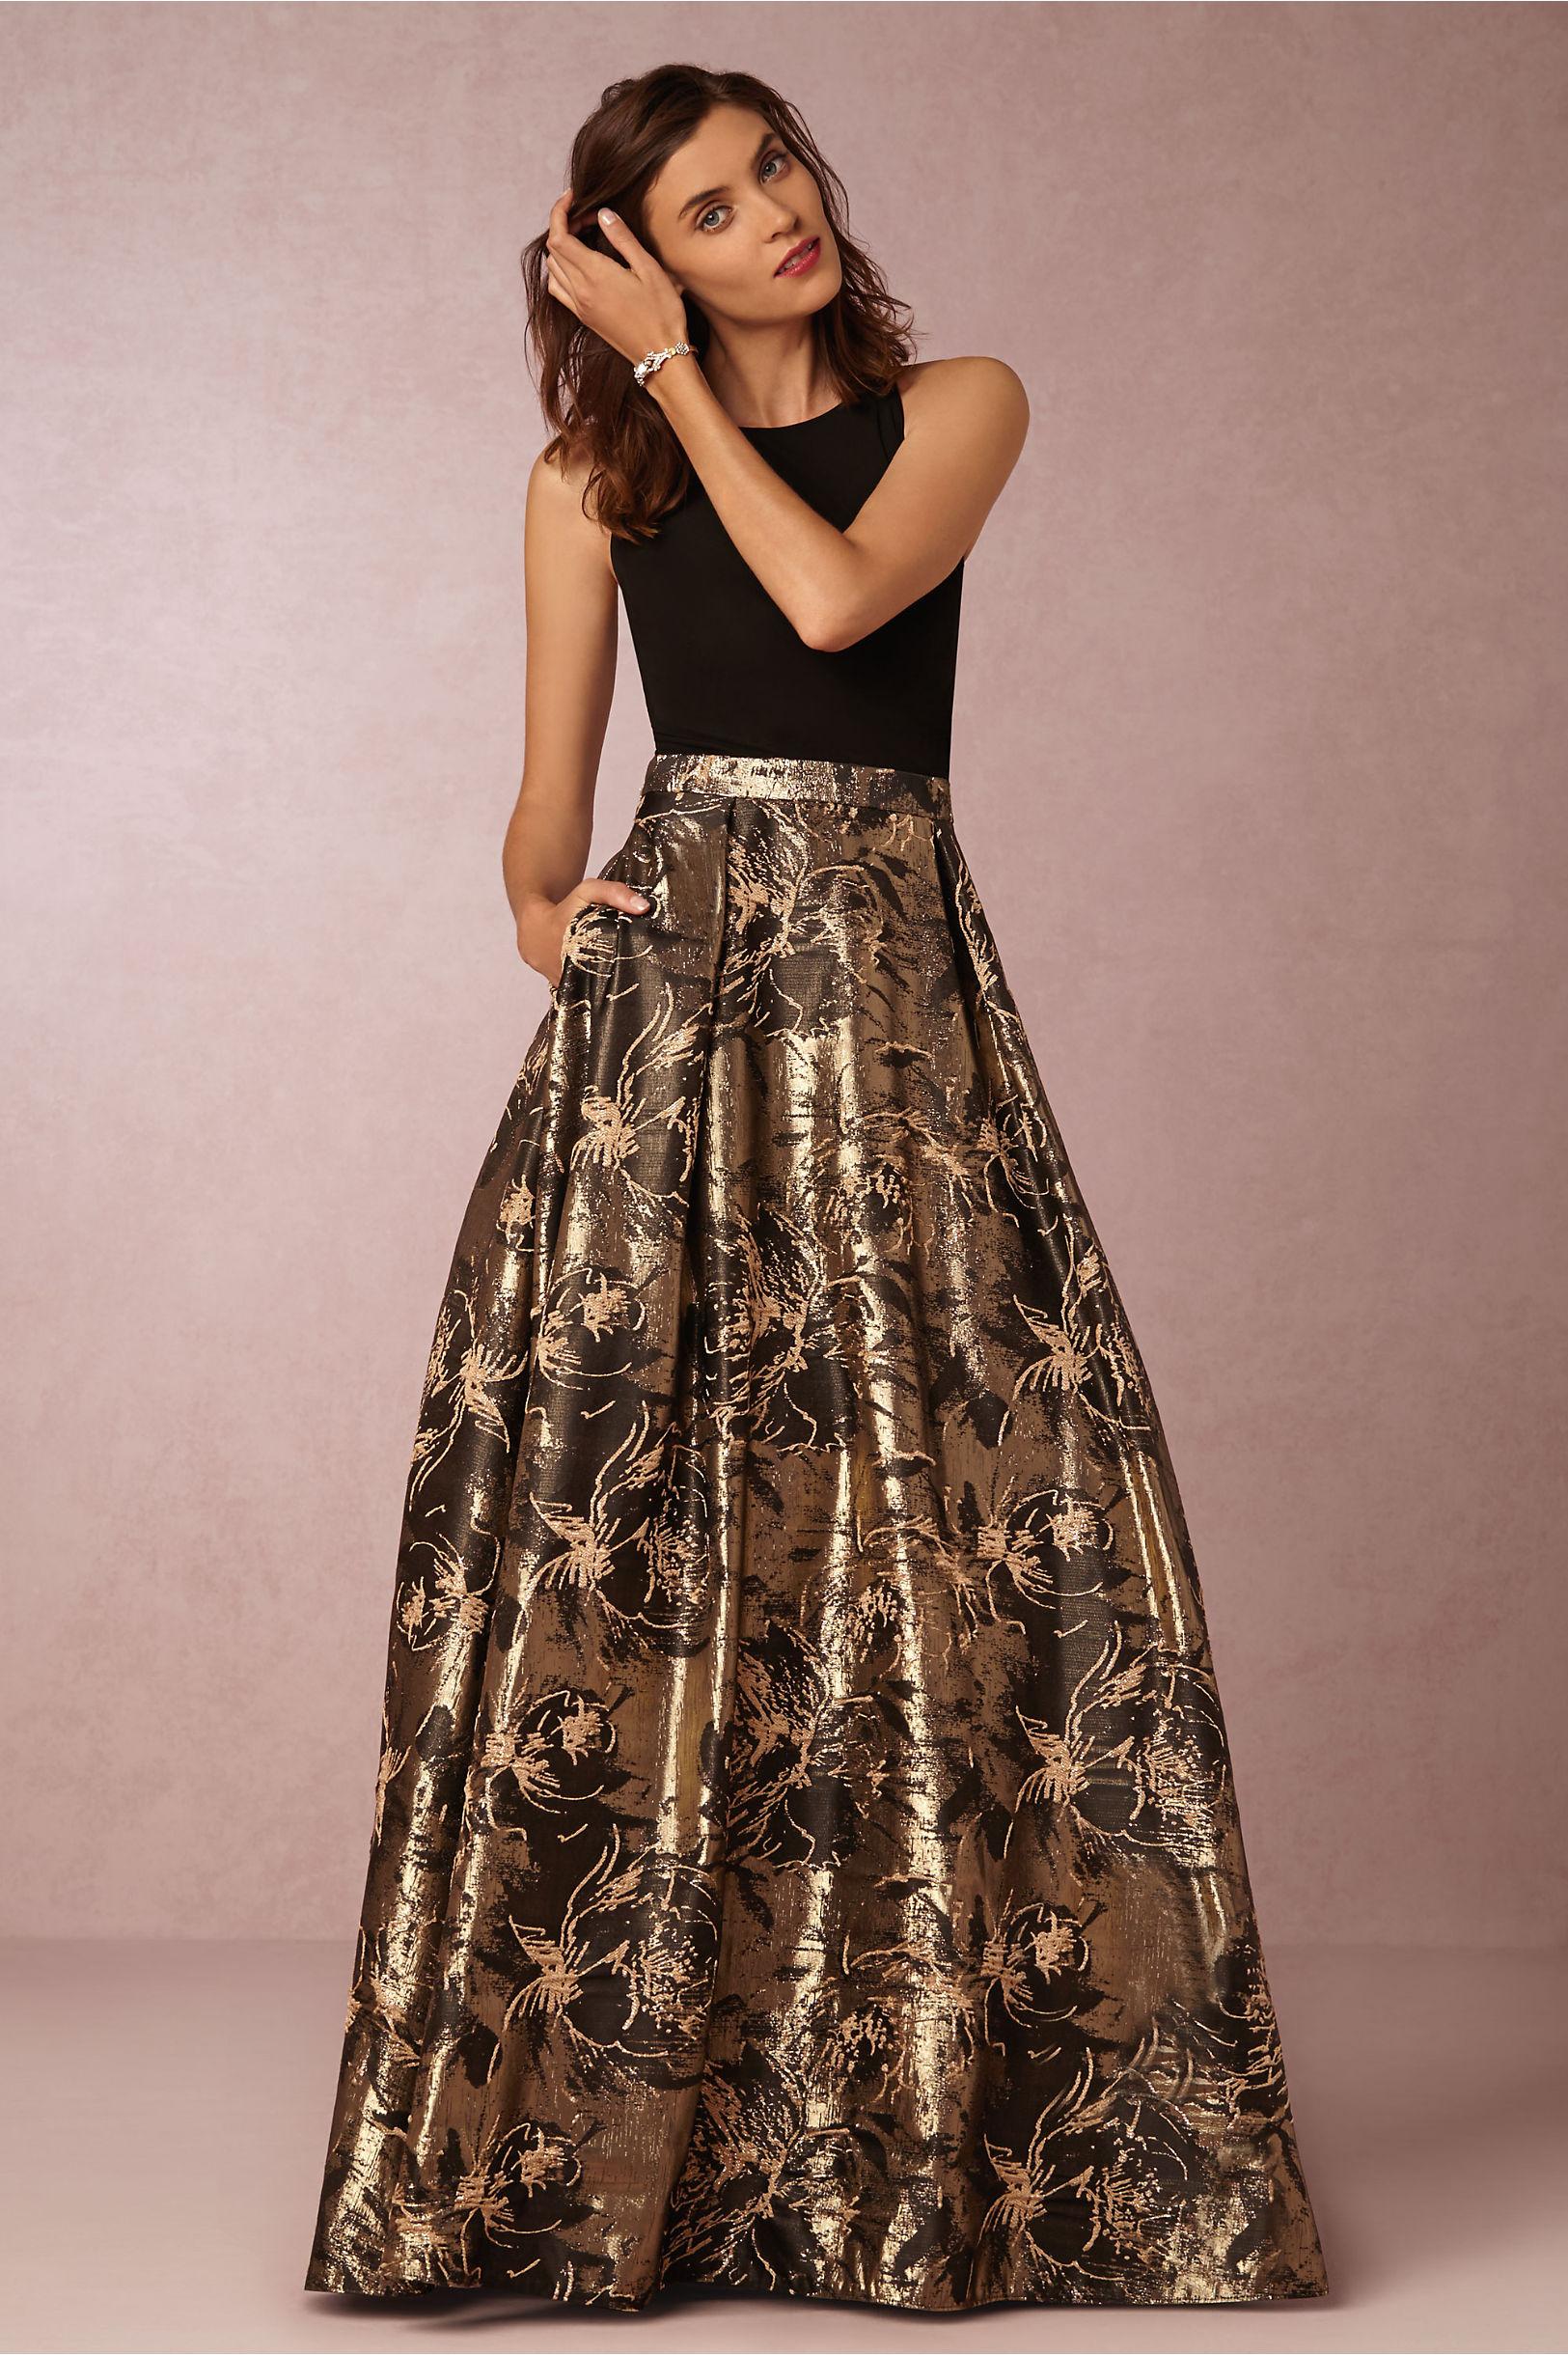 Sage Dress in Occasion Dresses | BHLDN